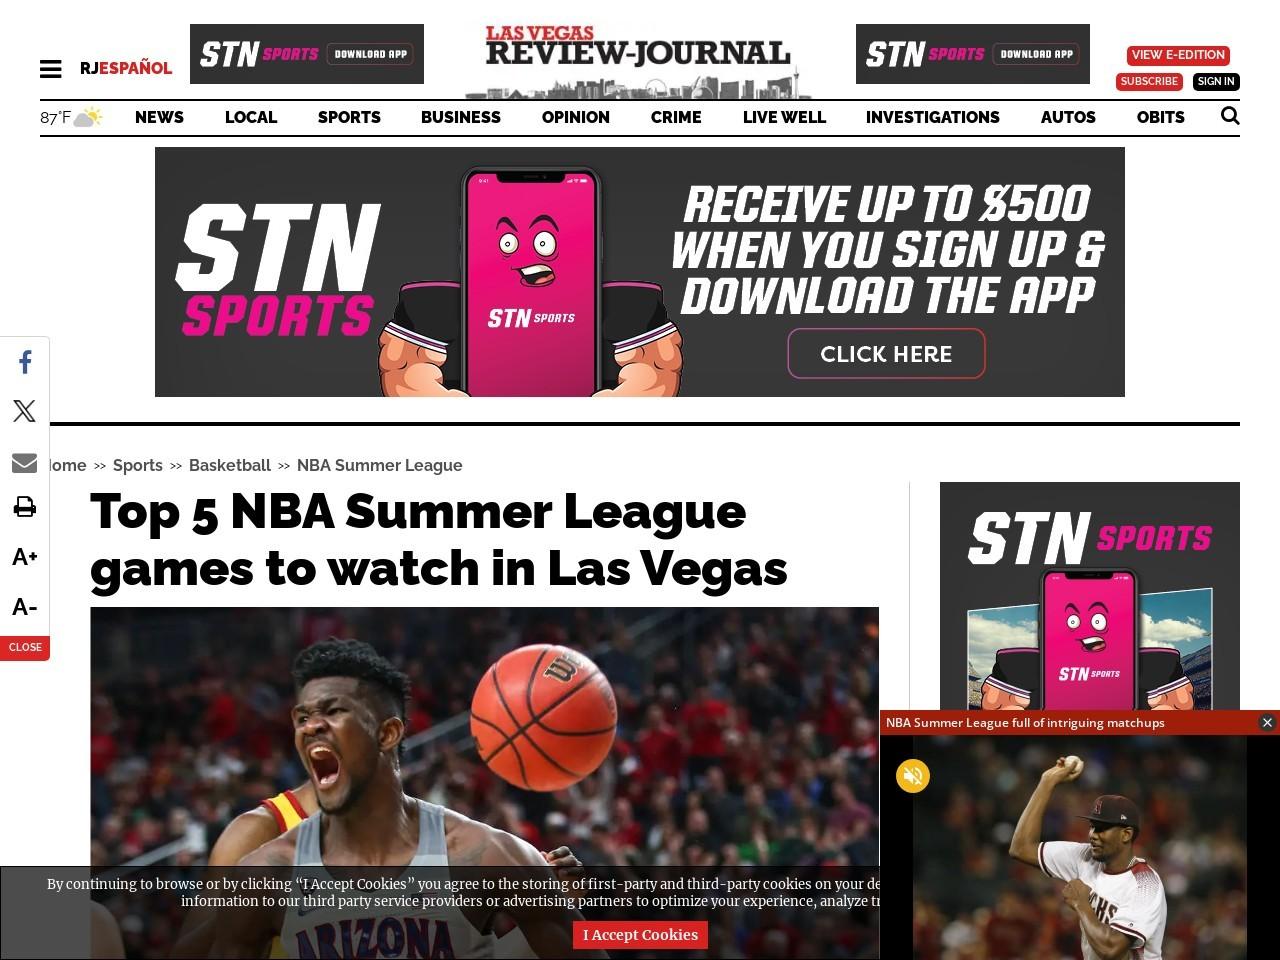 Top 5 NBA Summer League games to watch